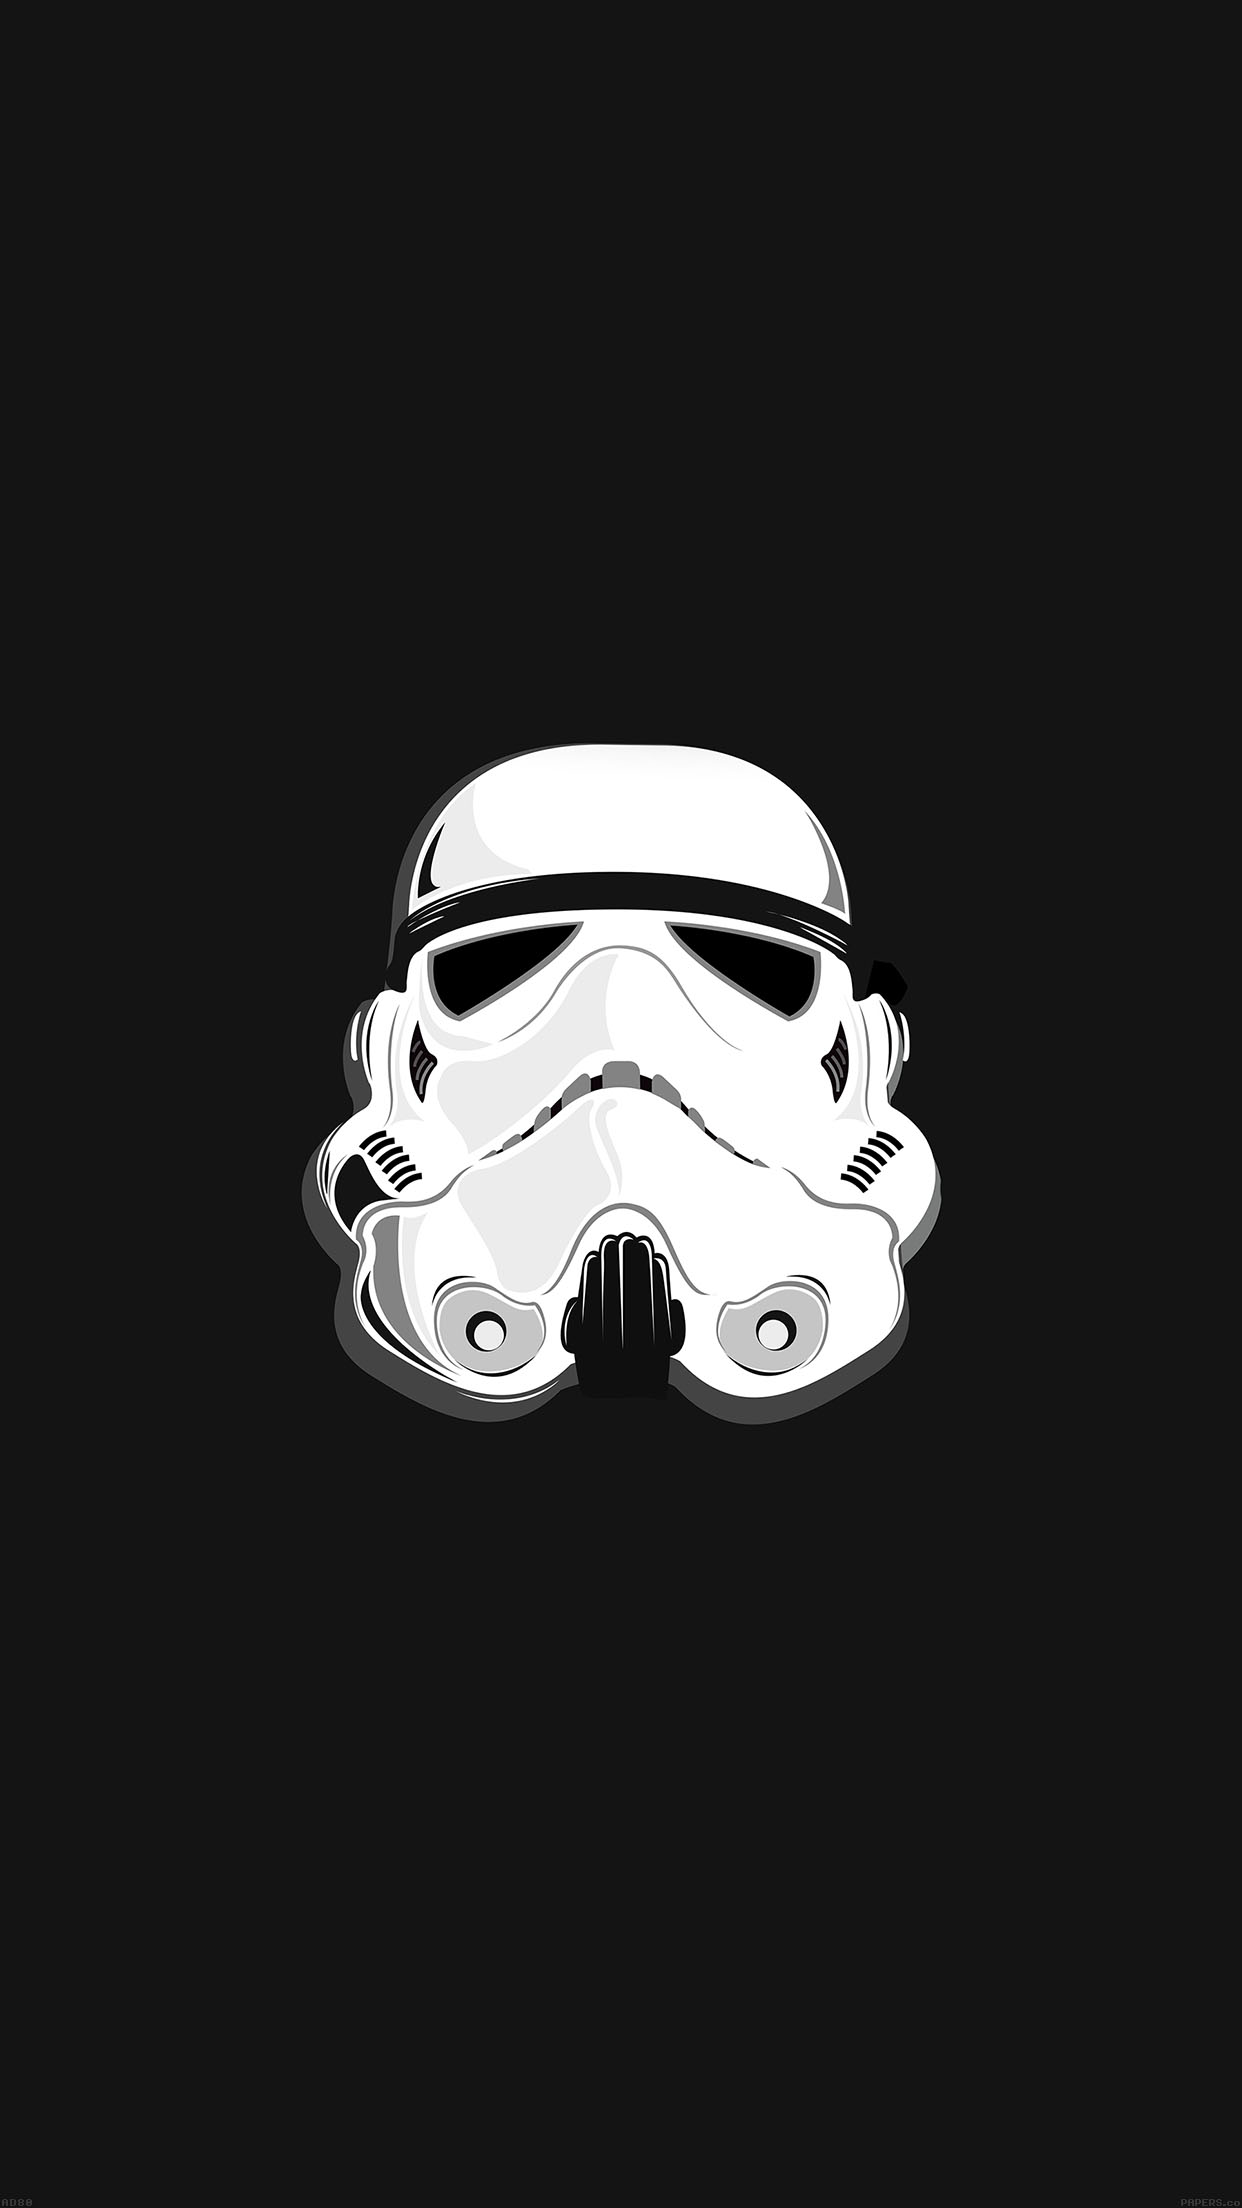 storm trooper starwars illust 34 iphone6 plus wallpaperjpg 1242x2208